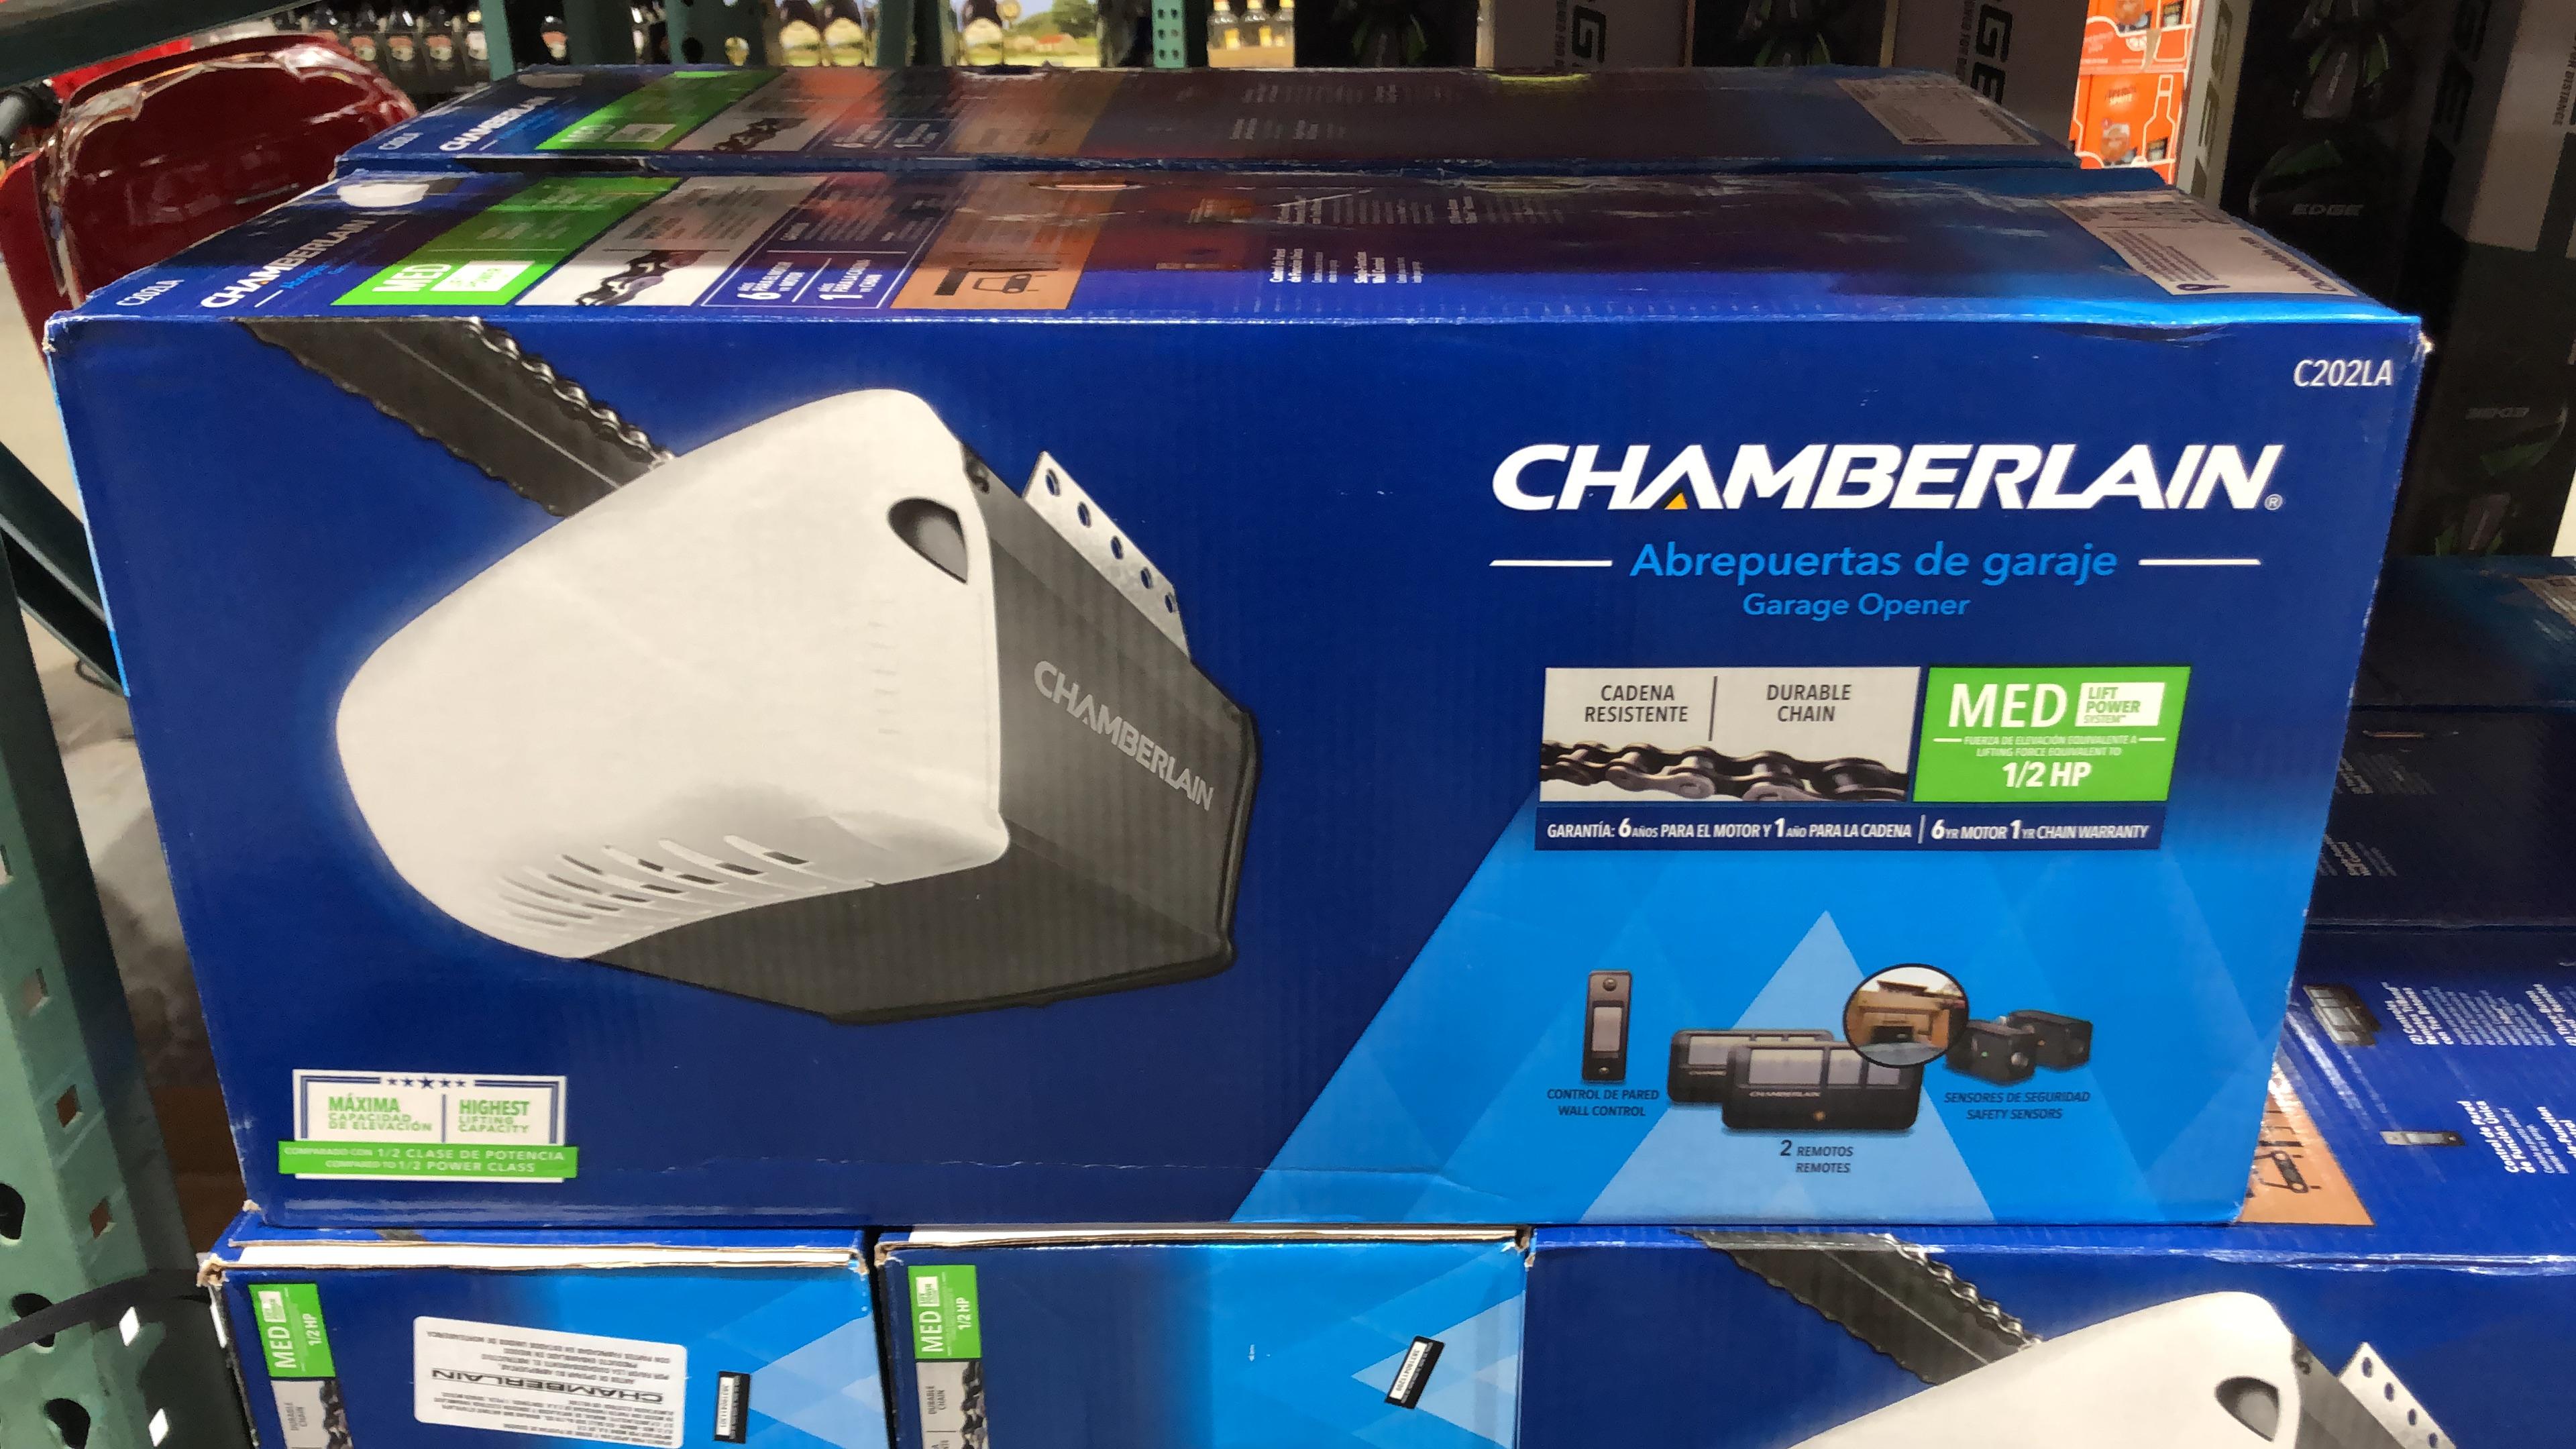 Costco tienda física - Abridor de garaje Chamberlain C202LA